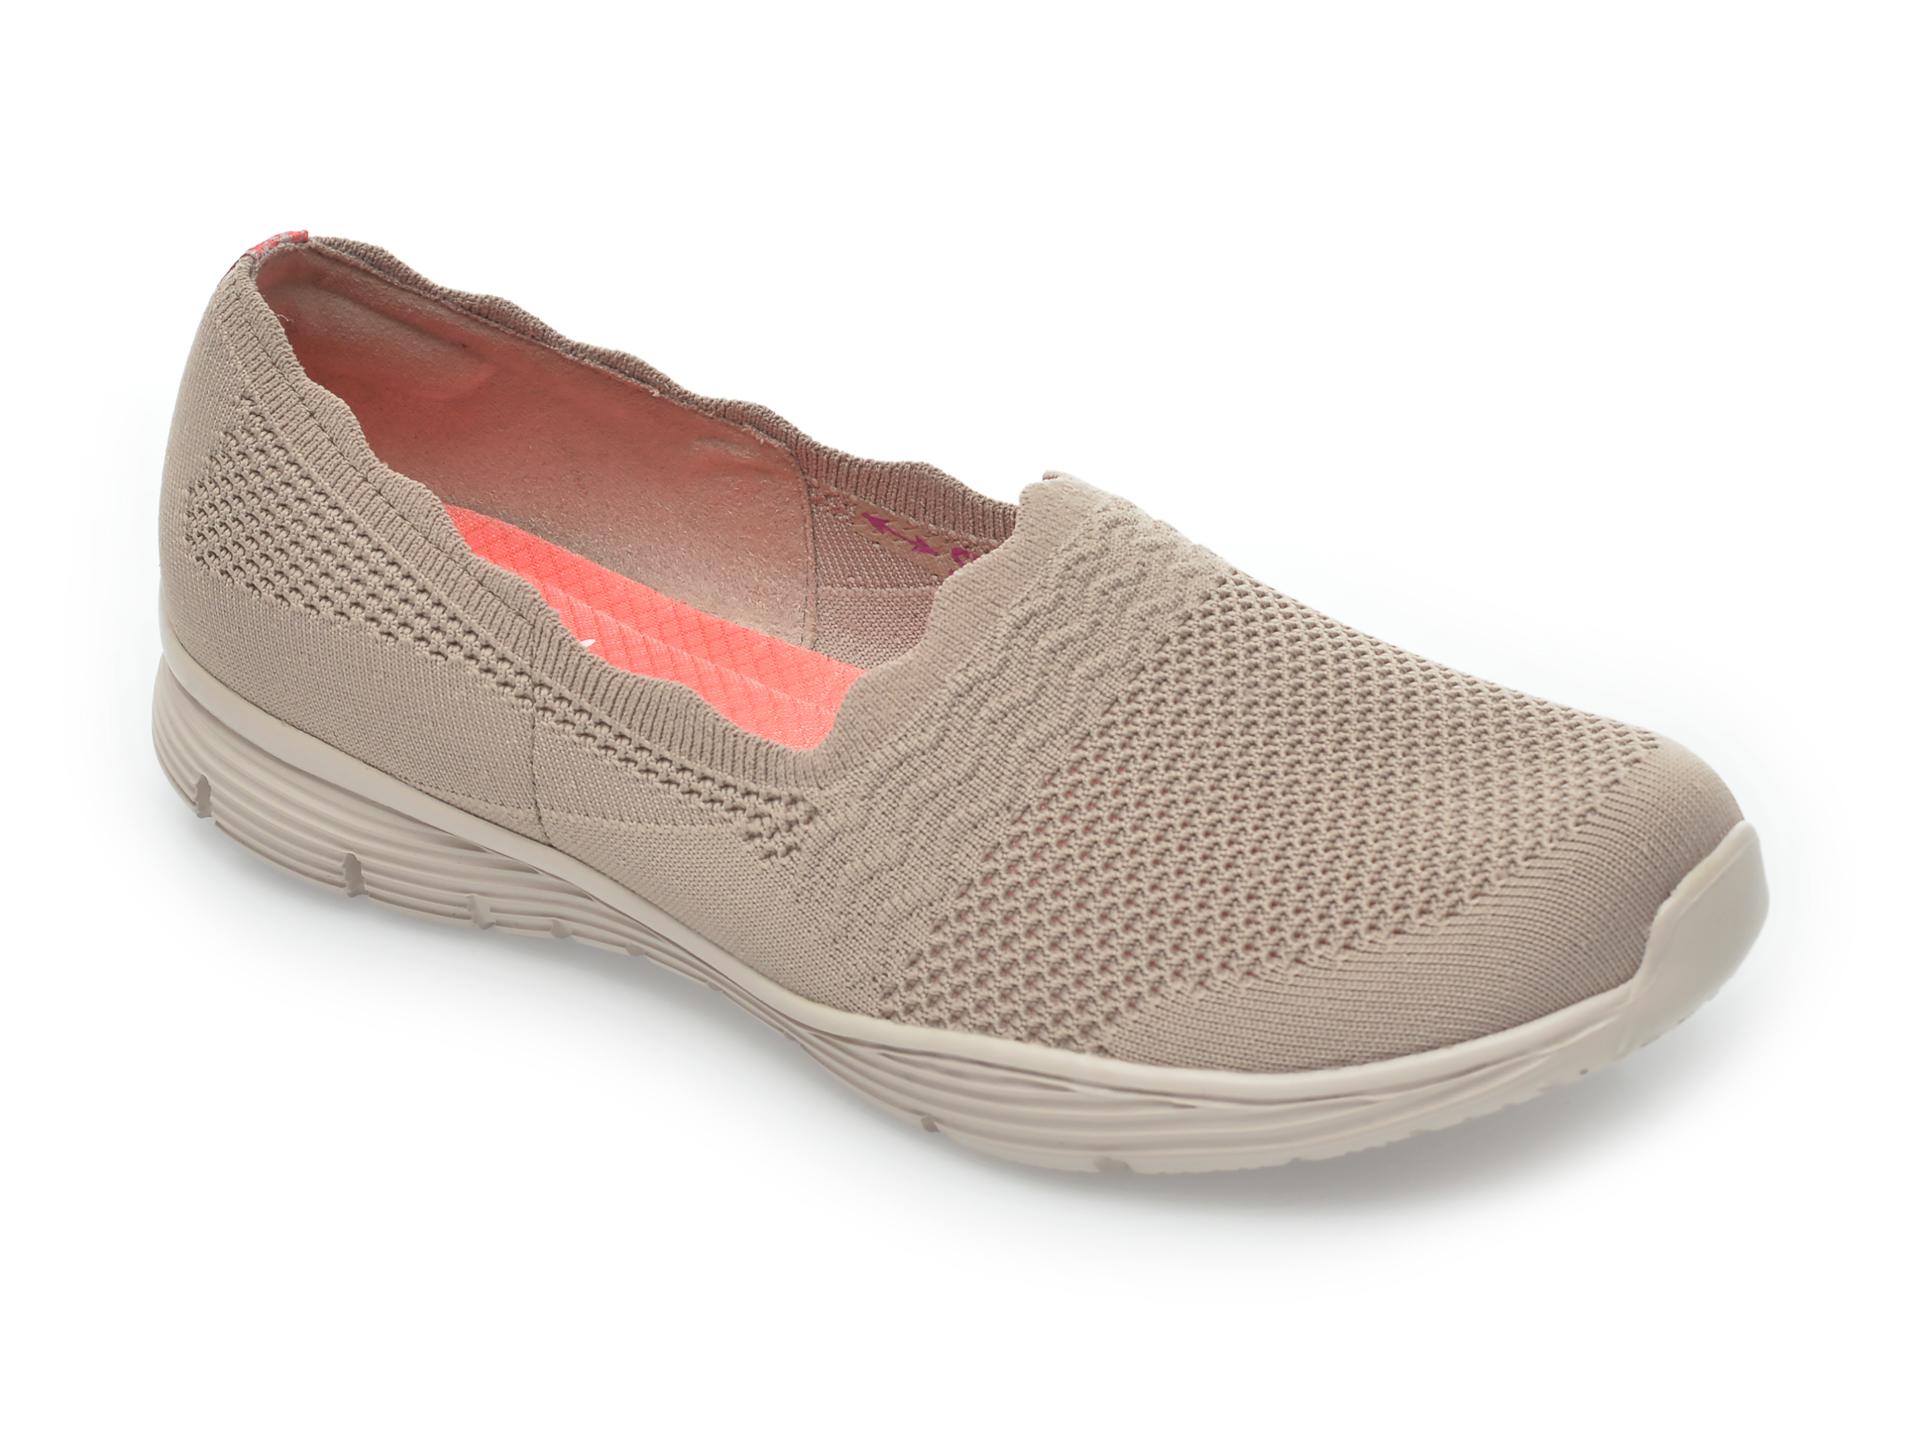 Pantofi sport SKECHERS gri, Seagerumpire, din material textil New